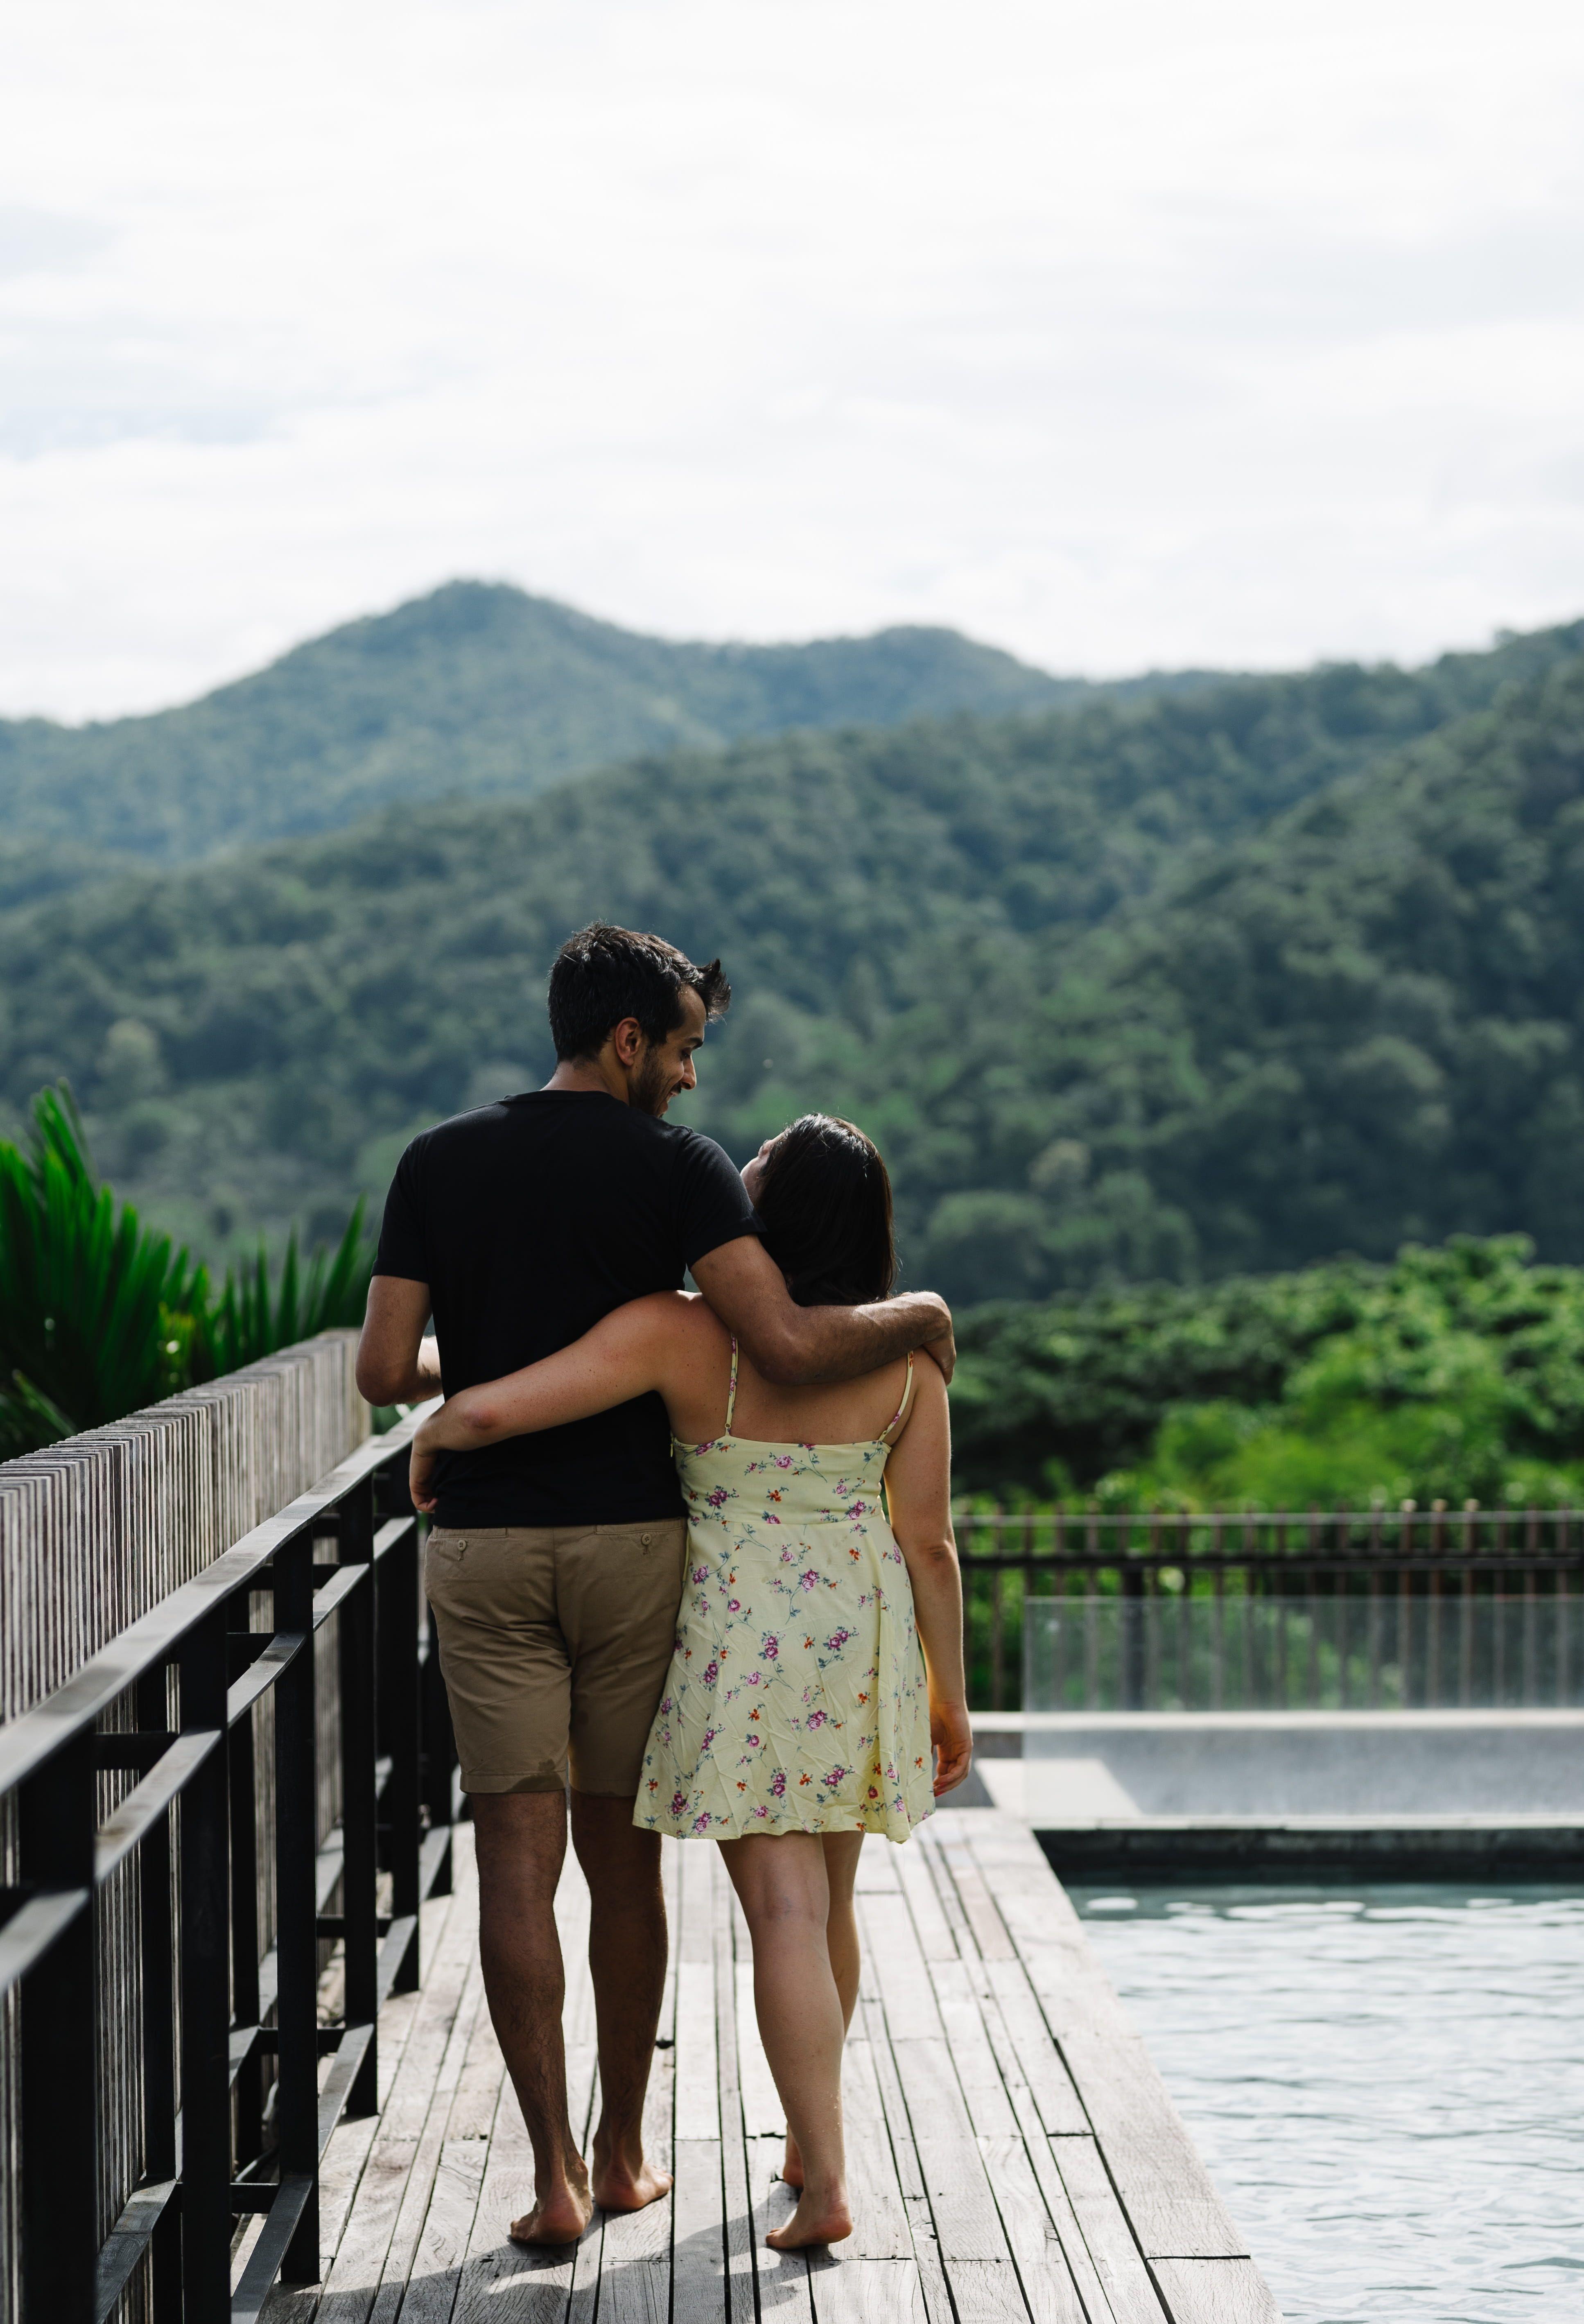 Team Building Indian Wedding Couple Romance Mountains Scenery Nature Couples Traveling Coup Popular Honeymoon Destinations Couples Honeymoon Destinations